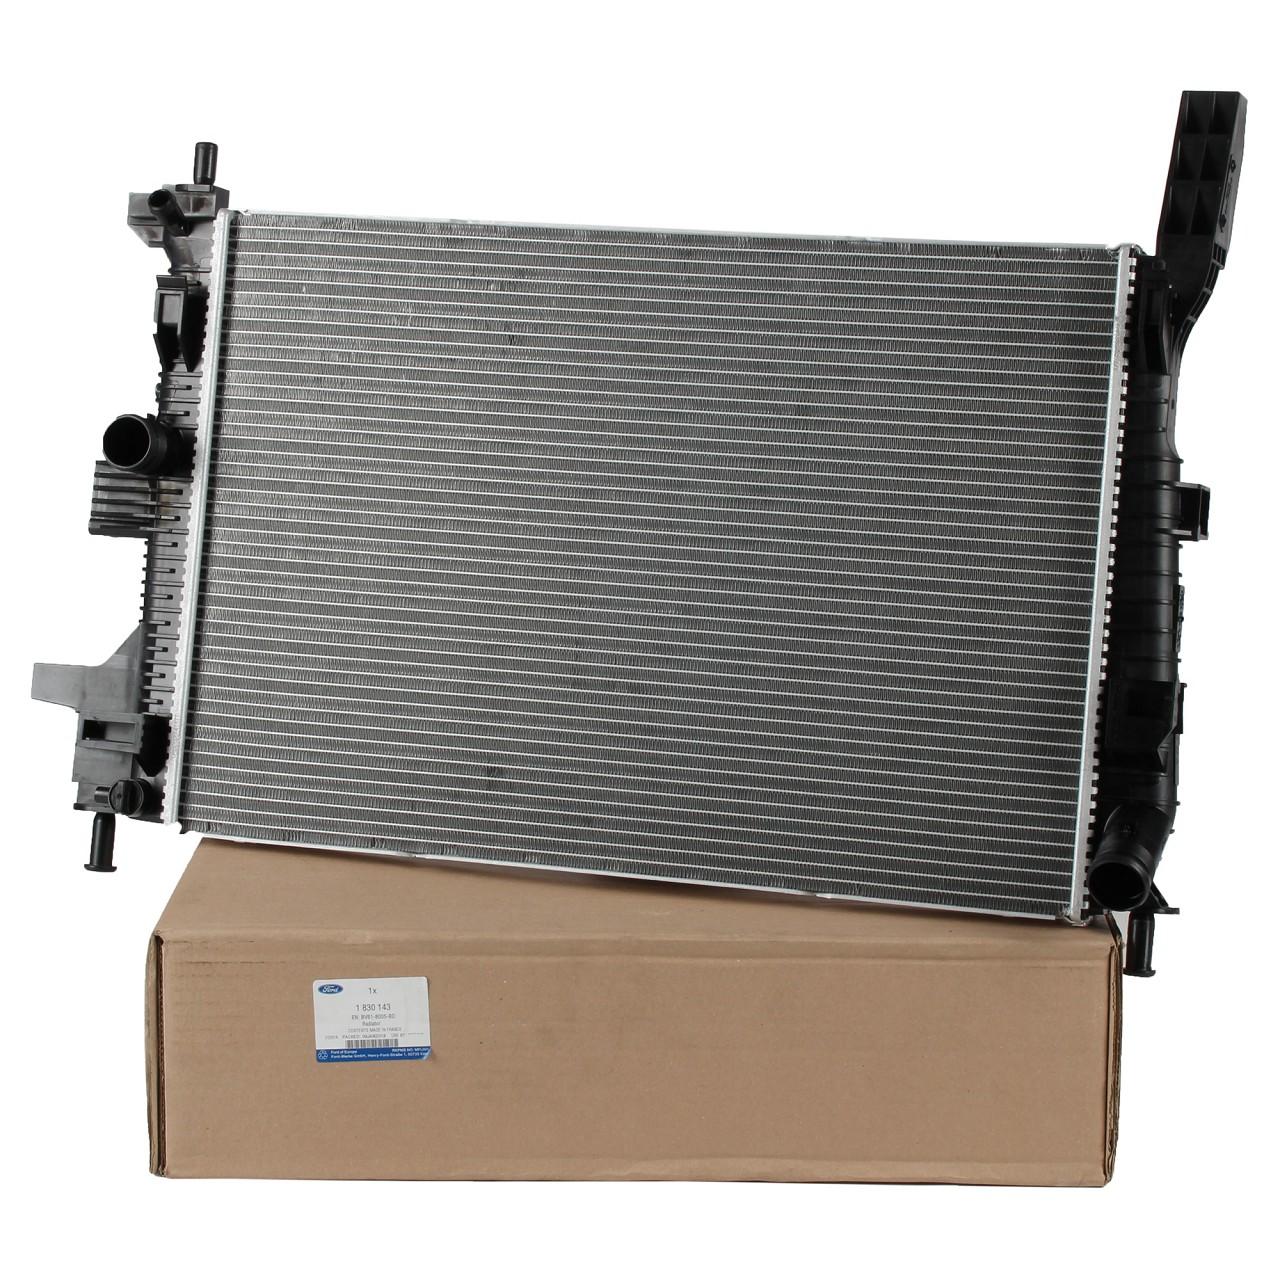 ORIGINAL Ford Kühler Motorkühler Wasserkühler FOCUS III 1.6TDCi 90/115PS 1830143